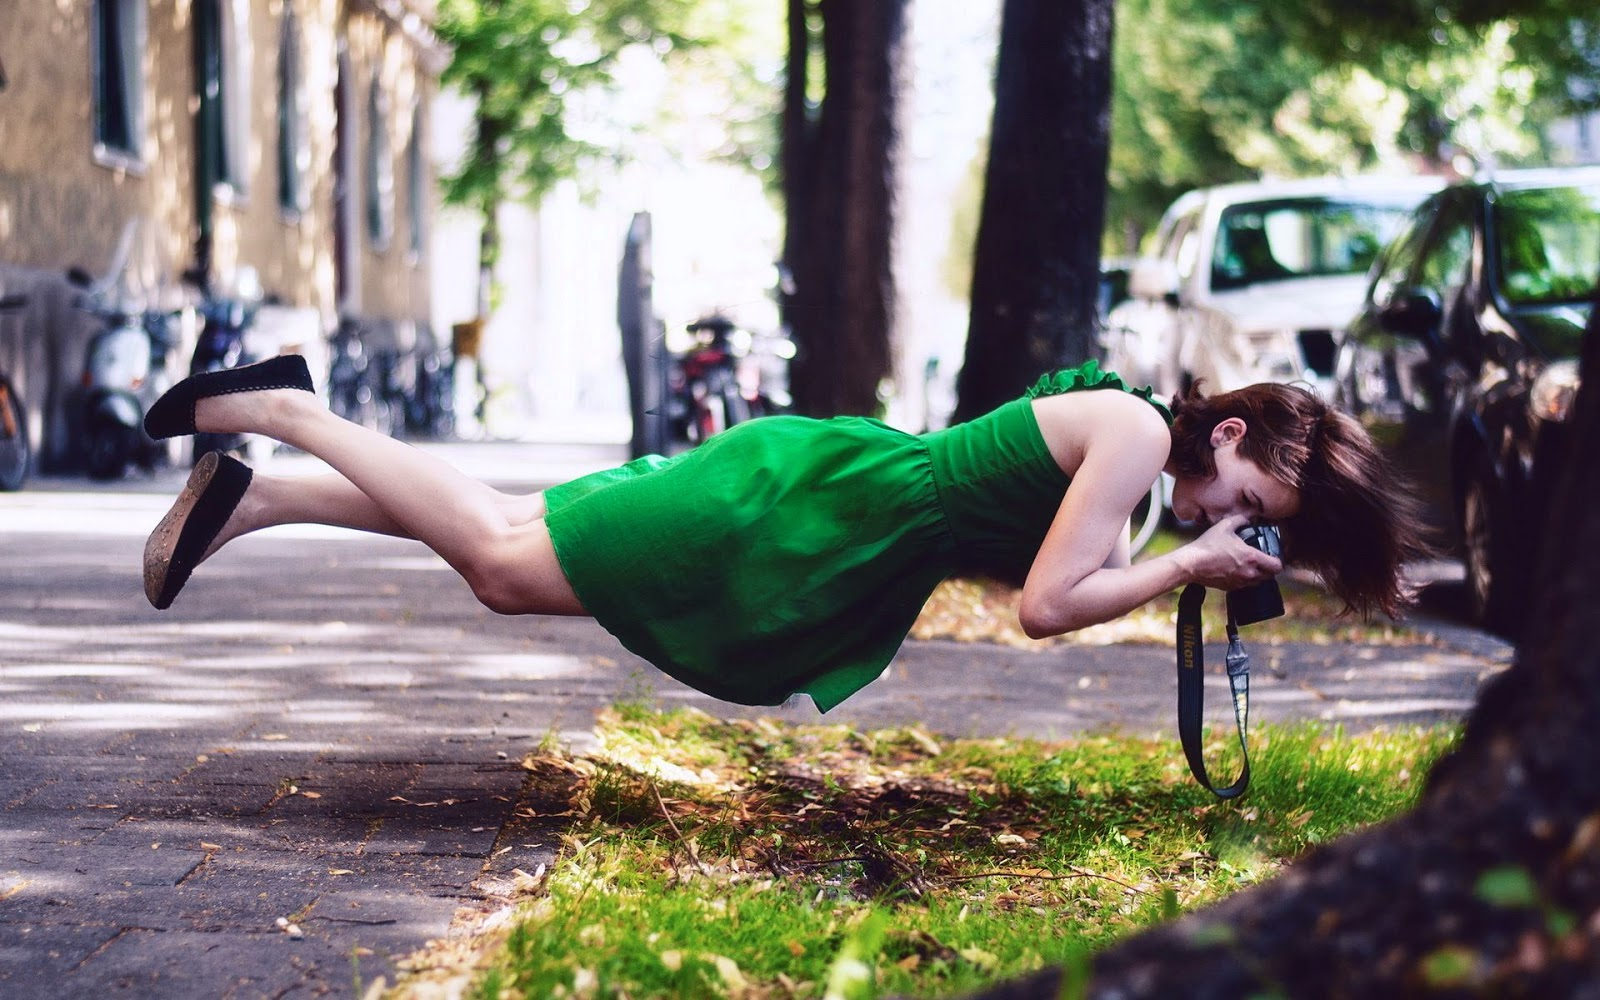 April Fools Day Girl Stree Cameras Gravitation Photos Download